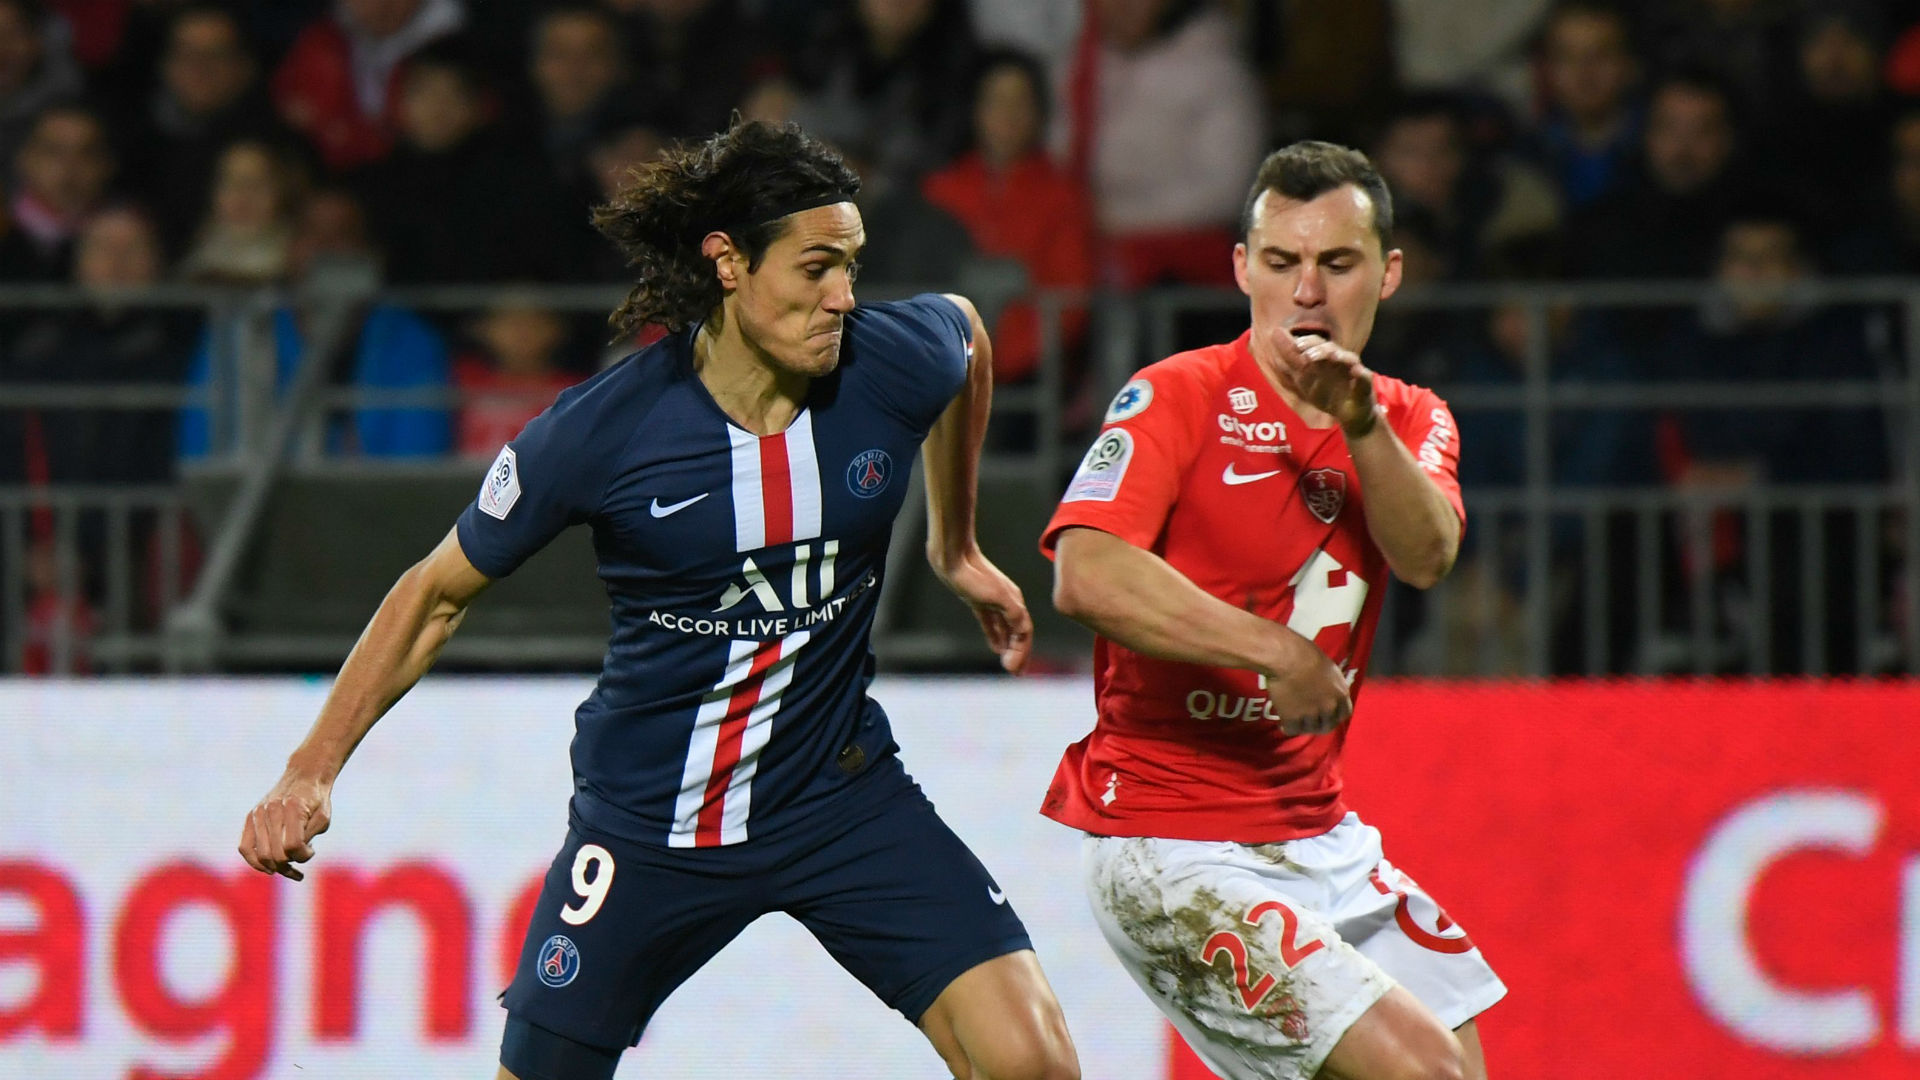 Edinson Cavani will need to get used to competing with fellow striker Mauro Icardi, according to Paris Saint-Germain boss Thomas Tuchel.